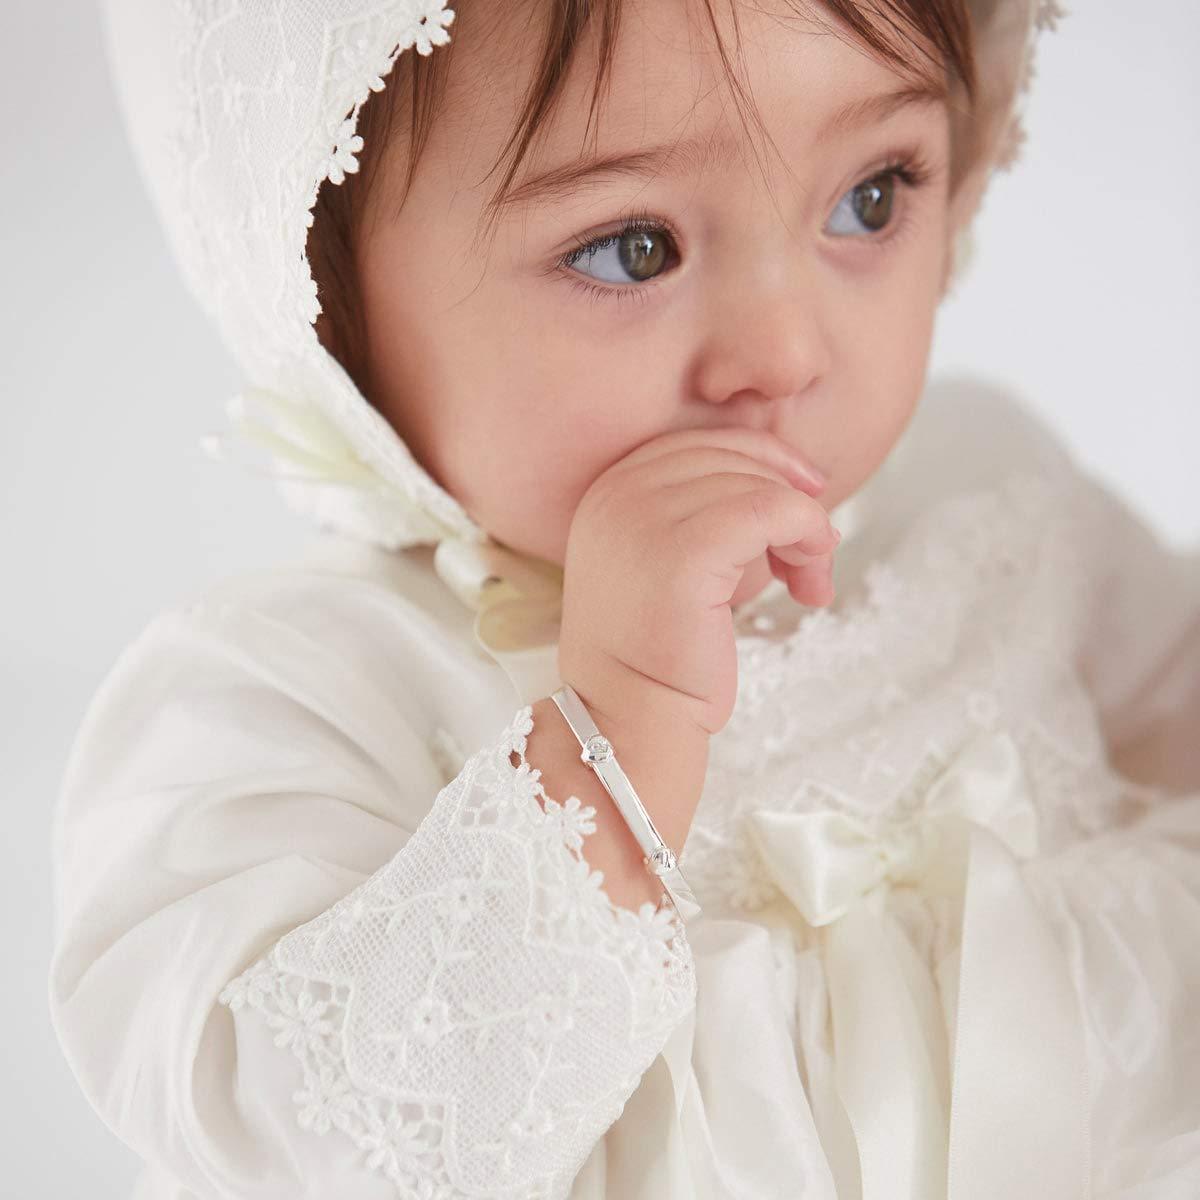 925 Sterling Silver Babys First Diamond Baptism Bangle Molly B London